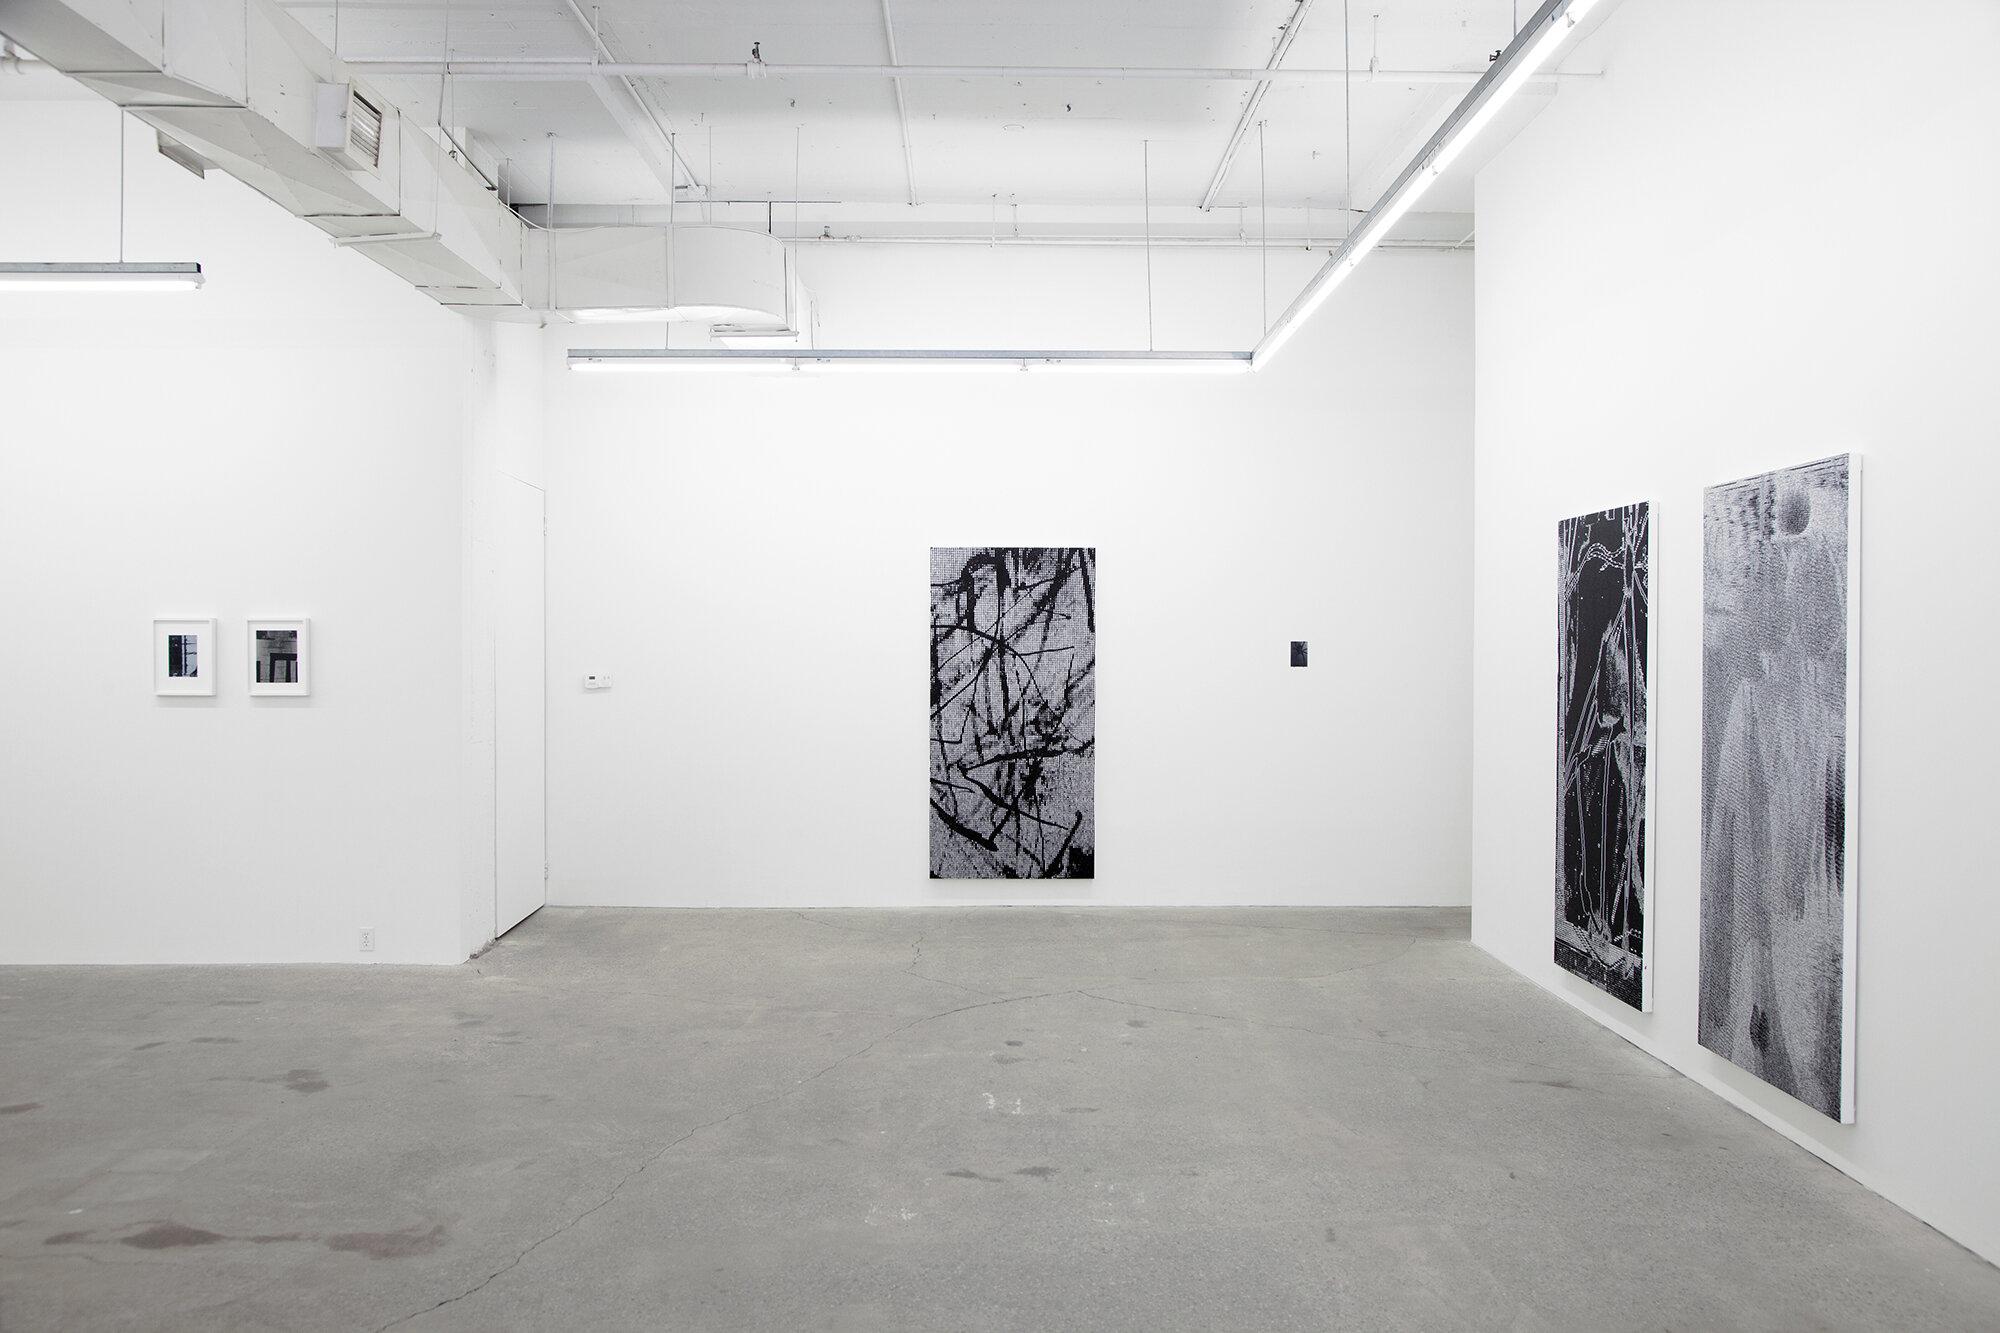 Jérôme Nadeau,  Poor Healer , 2019, vue d'exposition, Galerie Nicolas Robert.